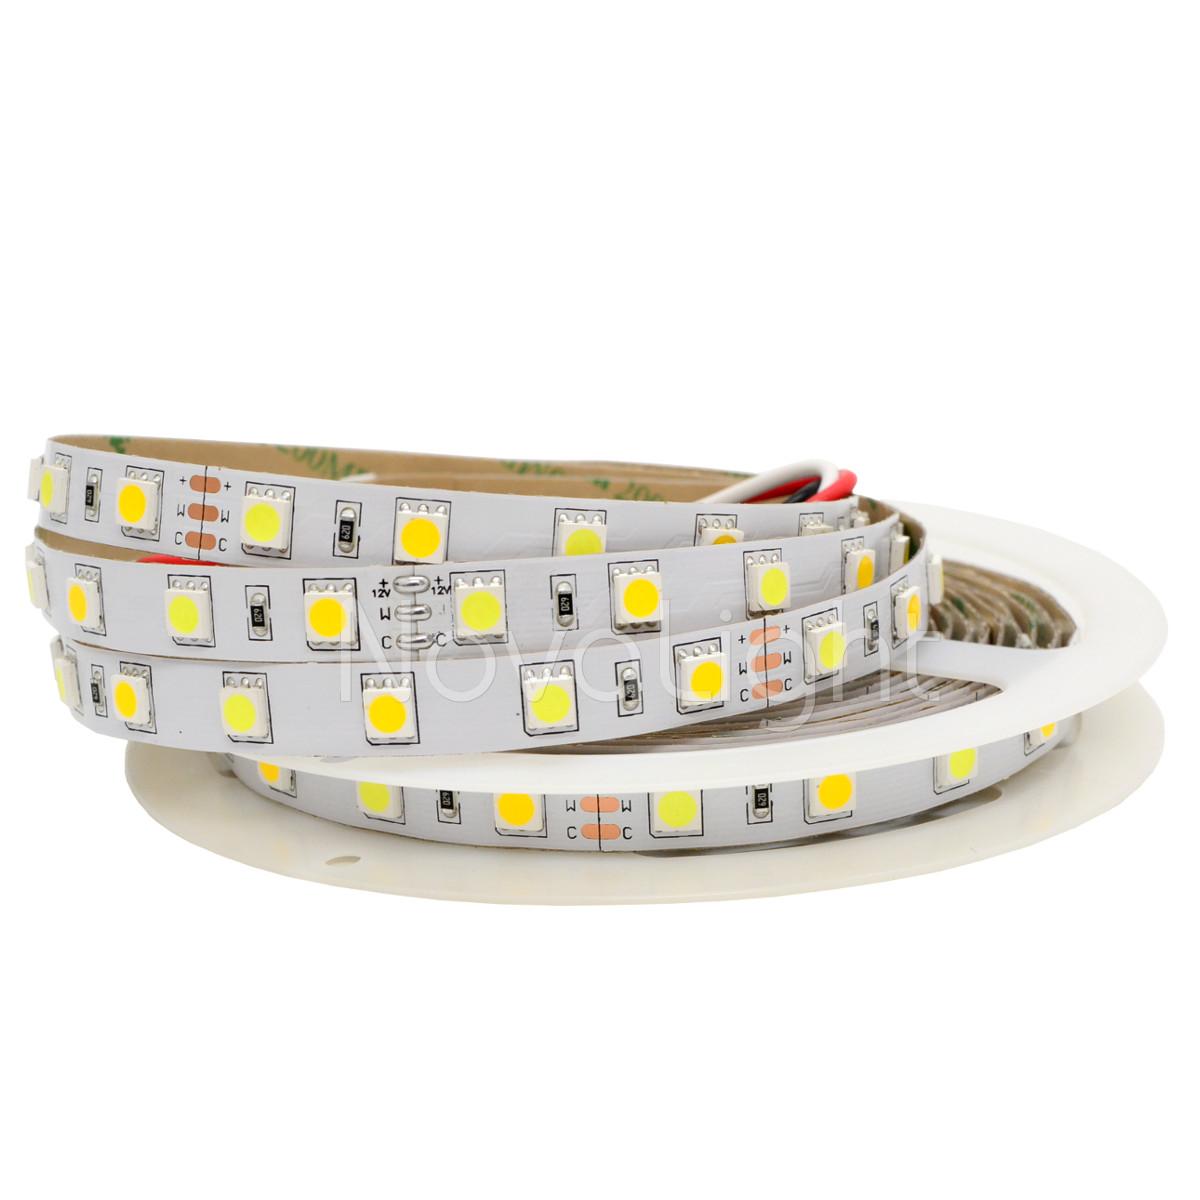 Tira LED Blanco Bicolor 300 LED 5050 IP20 12v 5mt